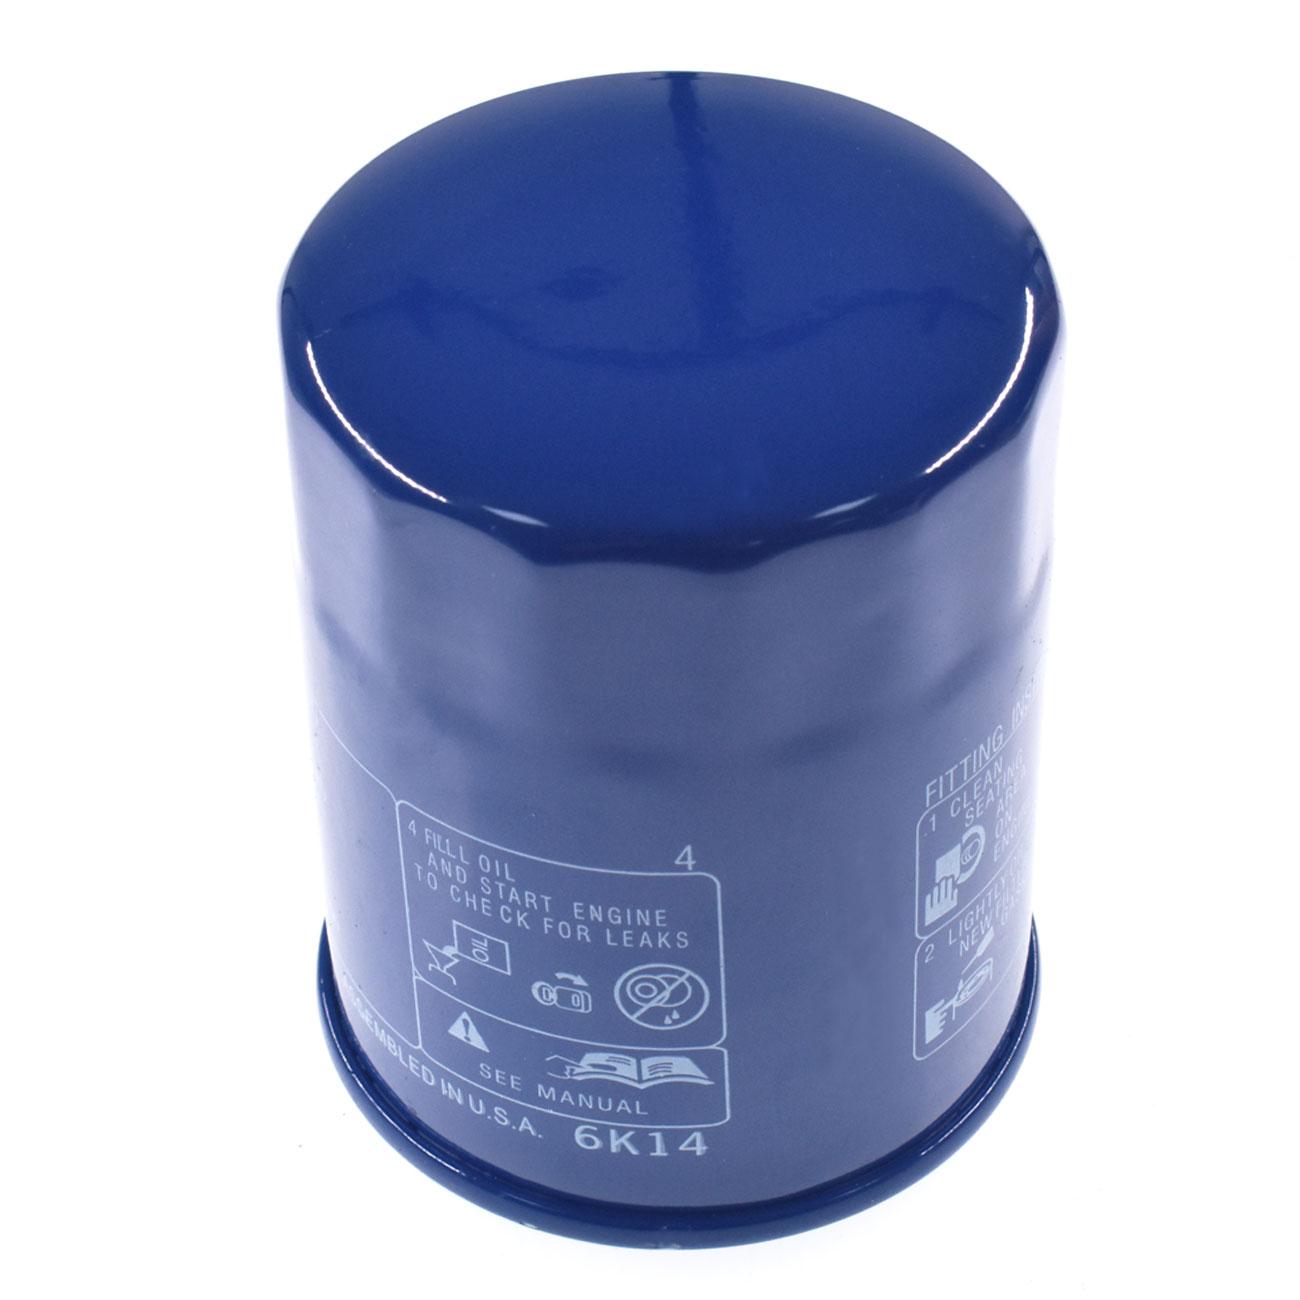 NEW Oil Filter Assembly FITS HONDA GX610 GX620 GX670 GX620